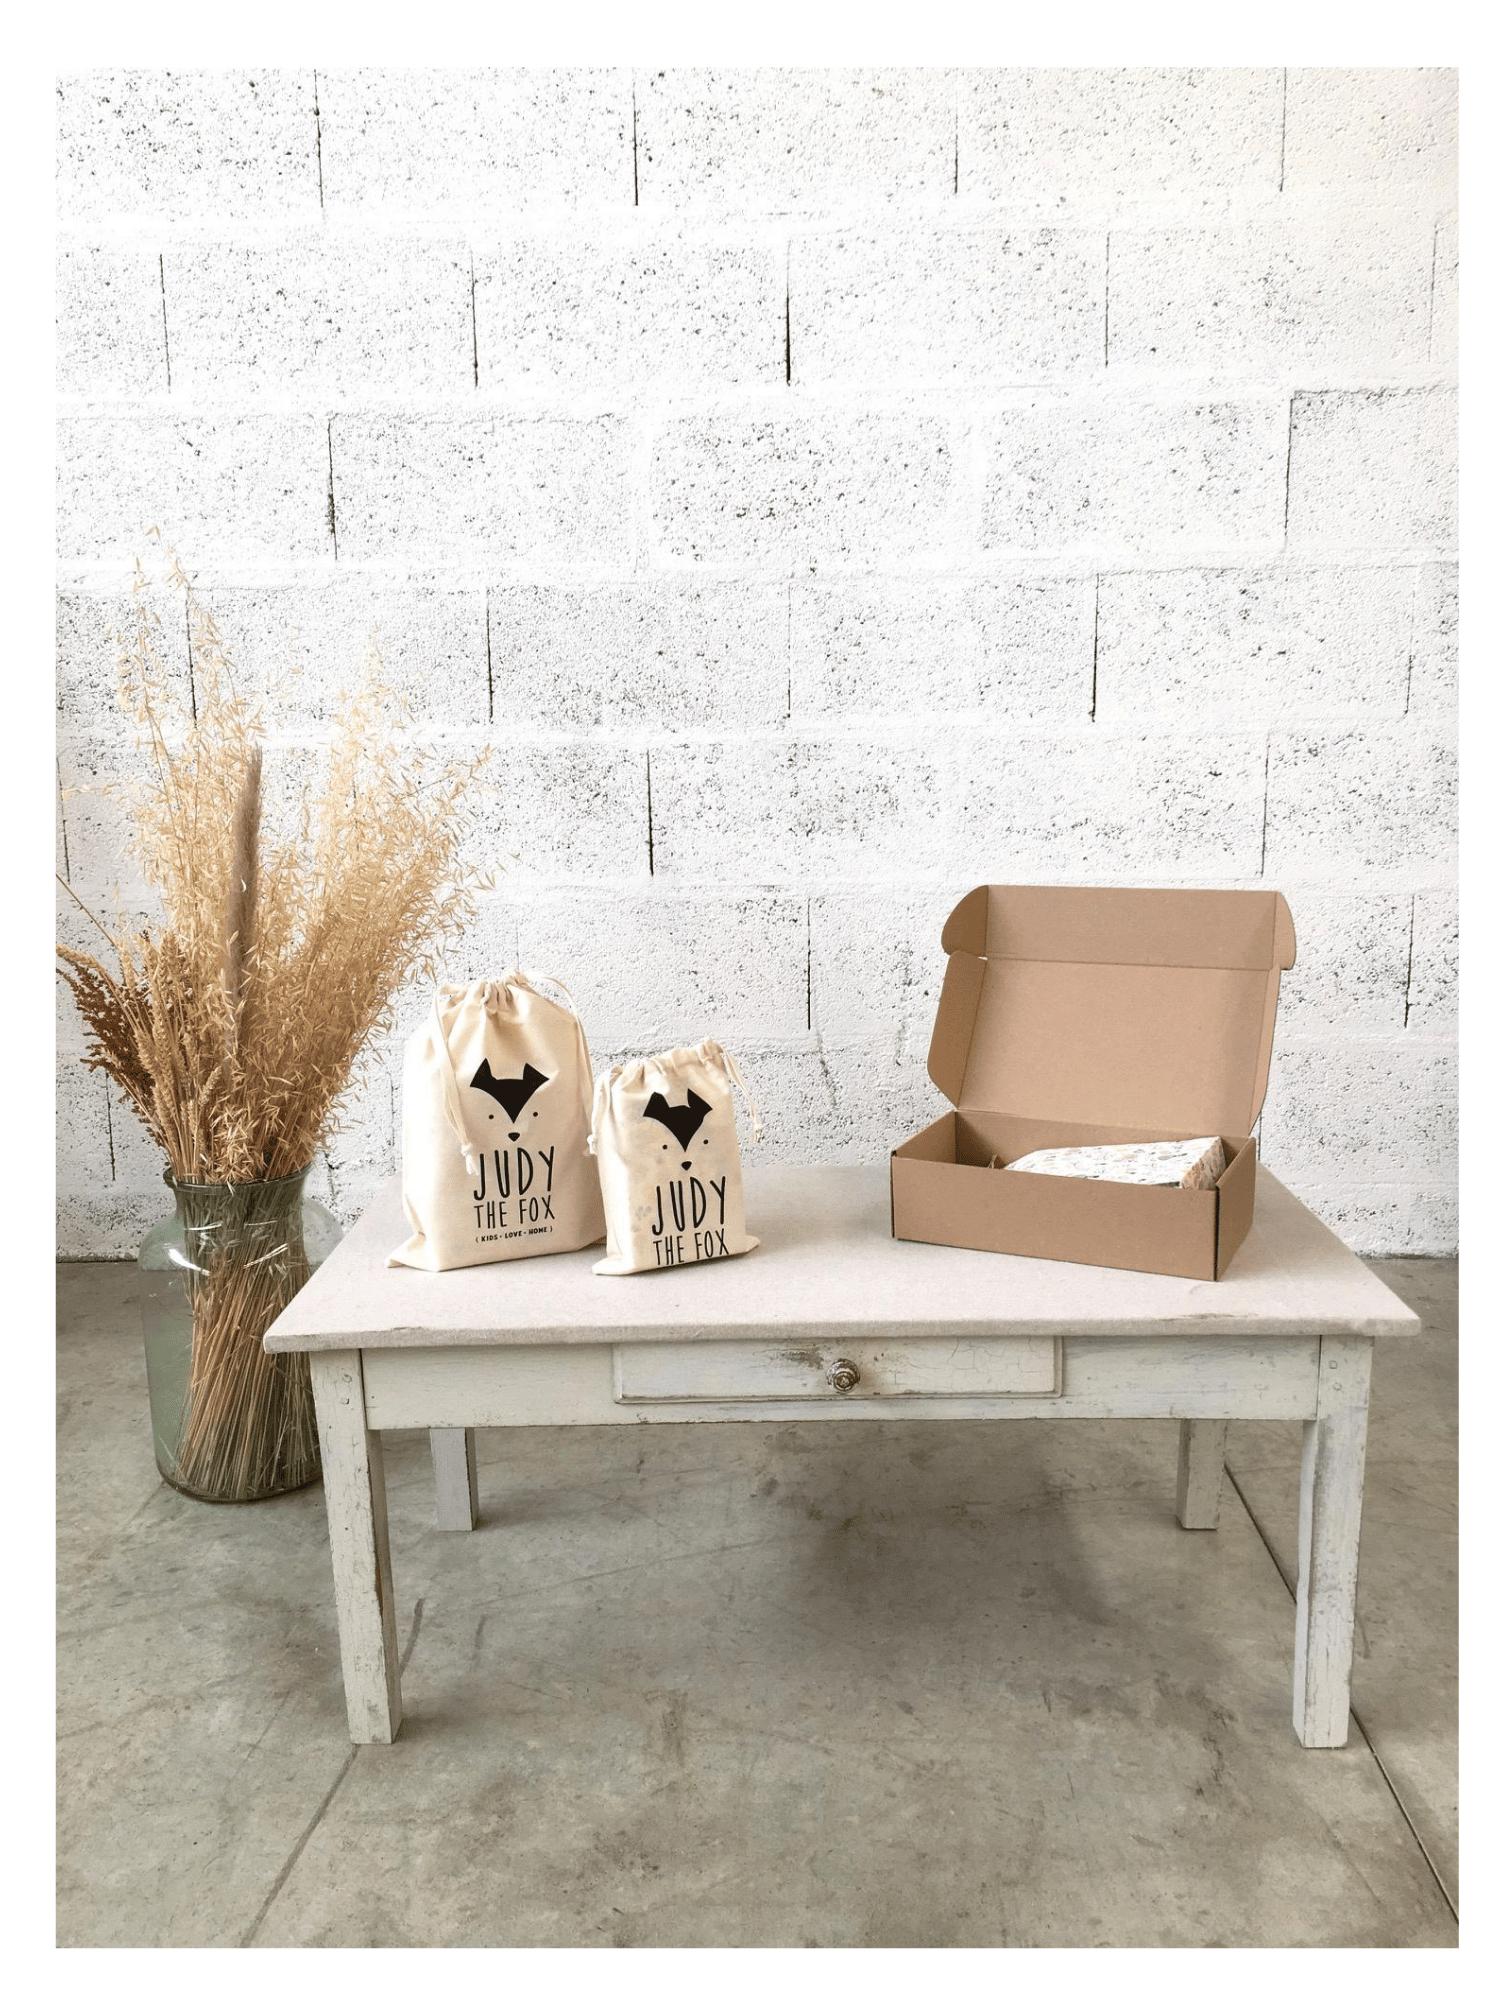 coffret-et-emballage-cadeau-judy-the-fox